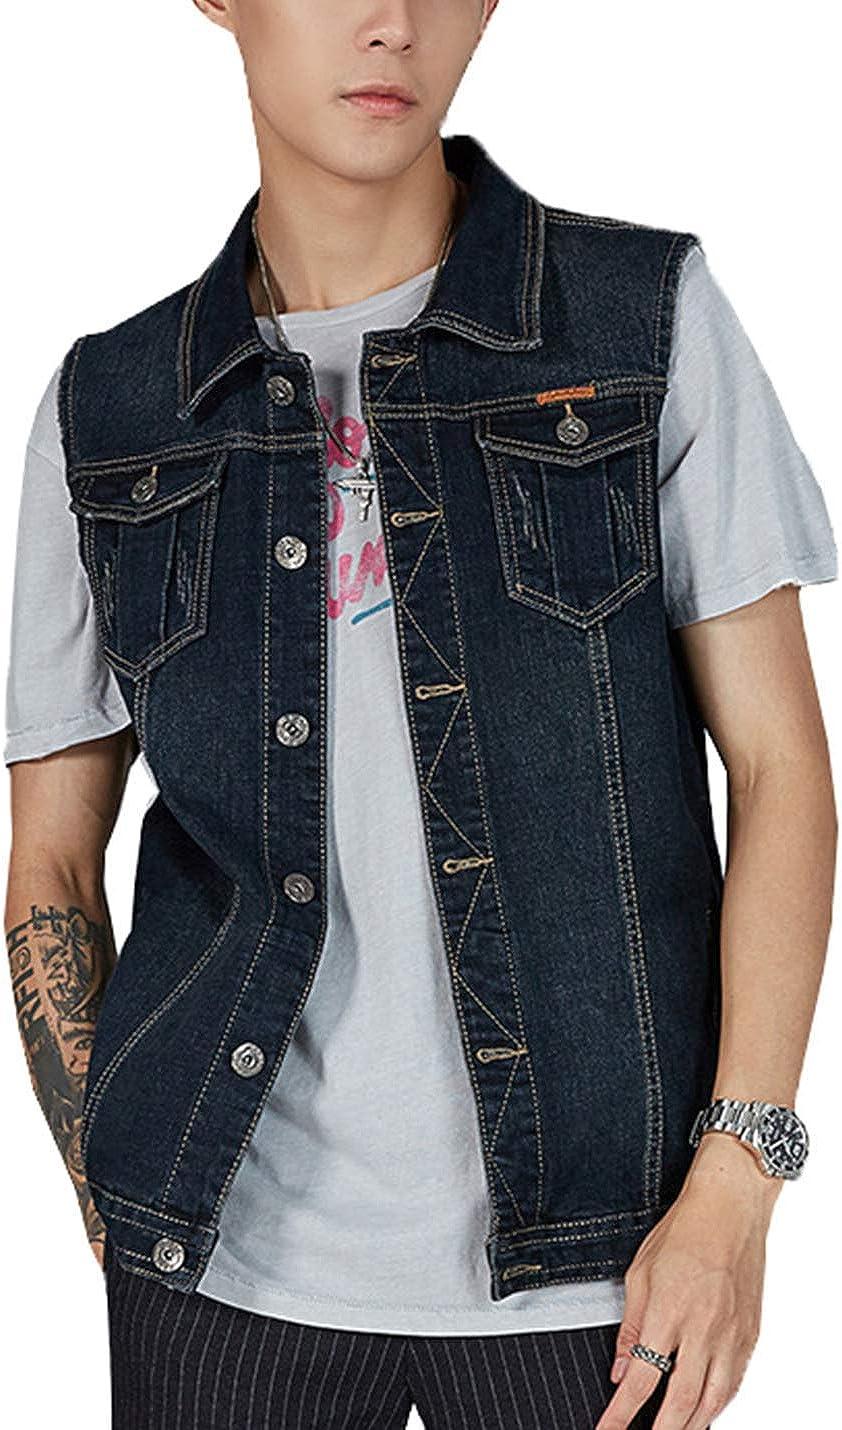 Alilyol Casual Plus Size Denim Vest for Men M-5XL Black Blue Plus Size Button Down Sleeveless Jeans Vests Jacket Motorcycle